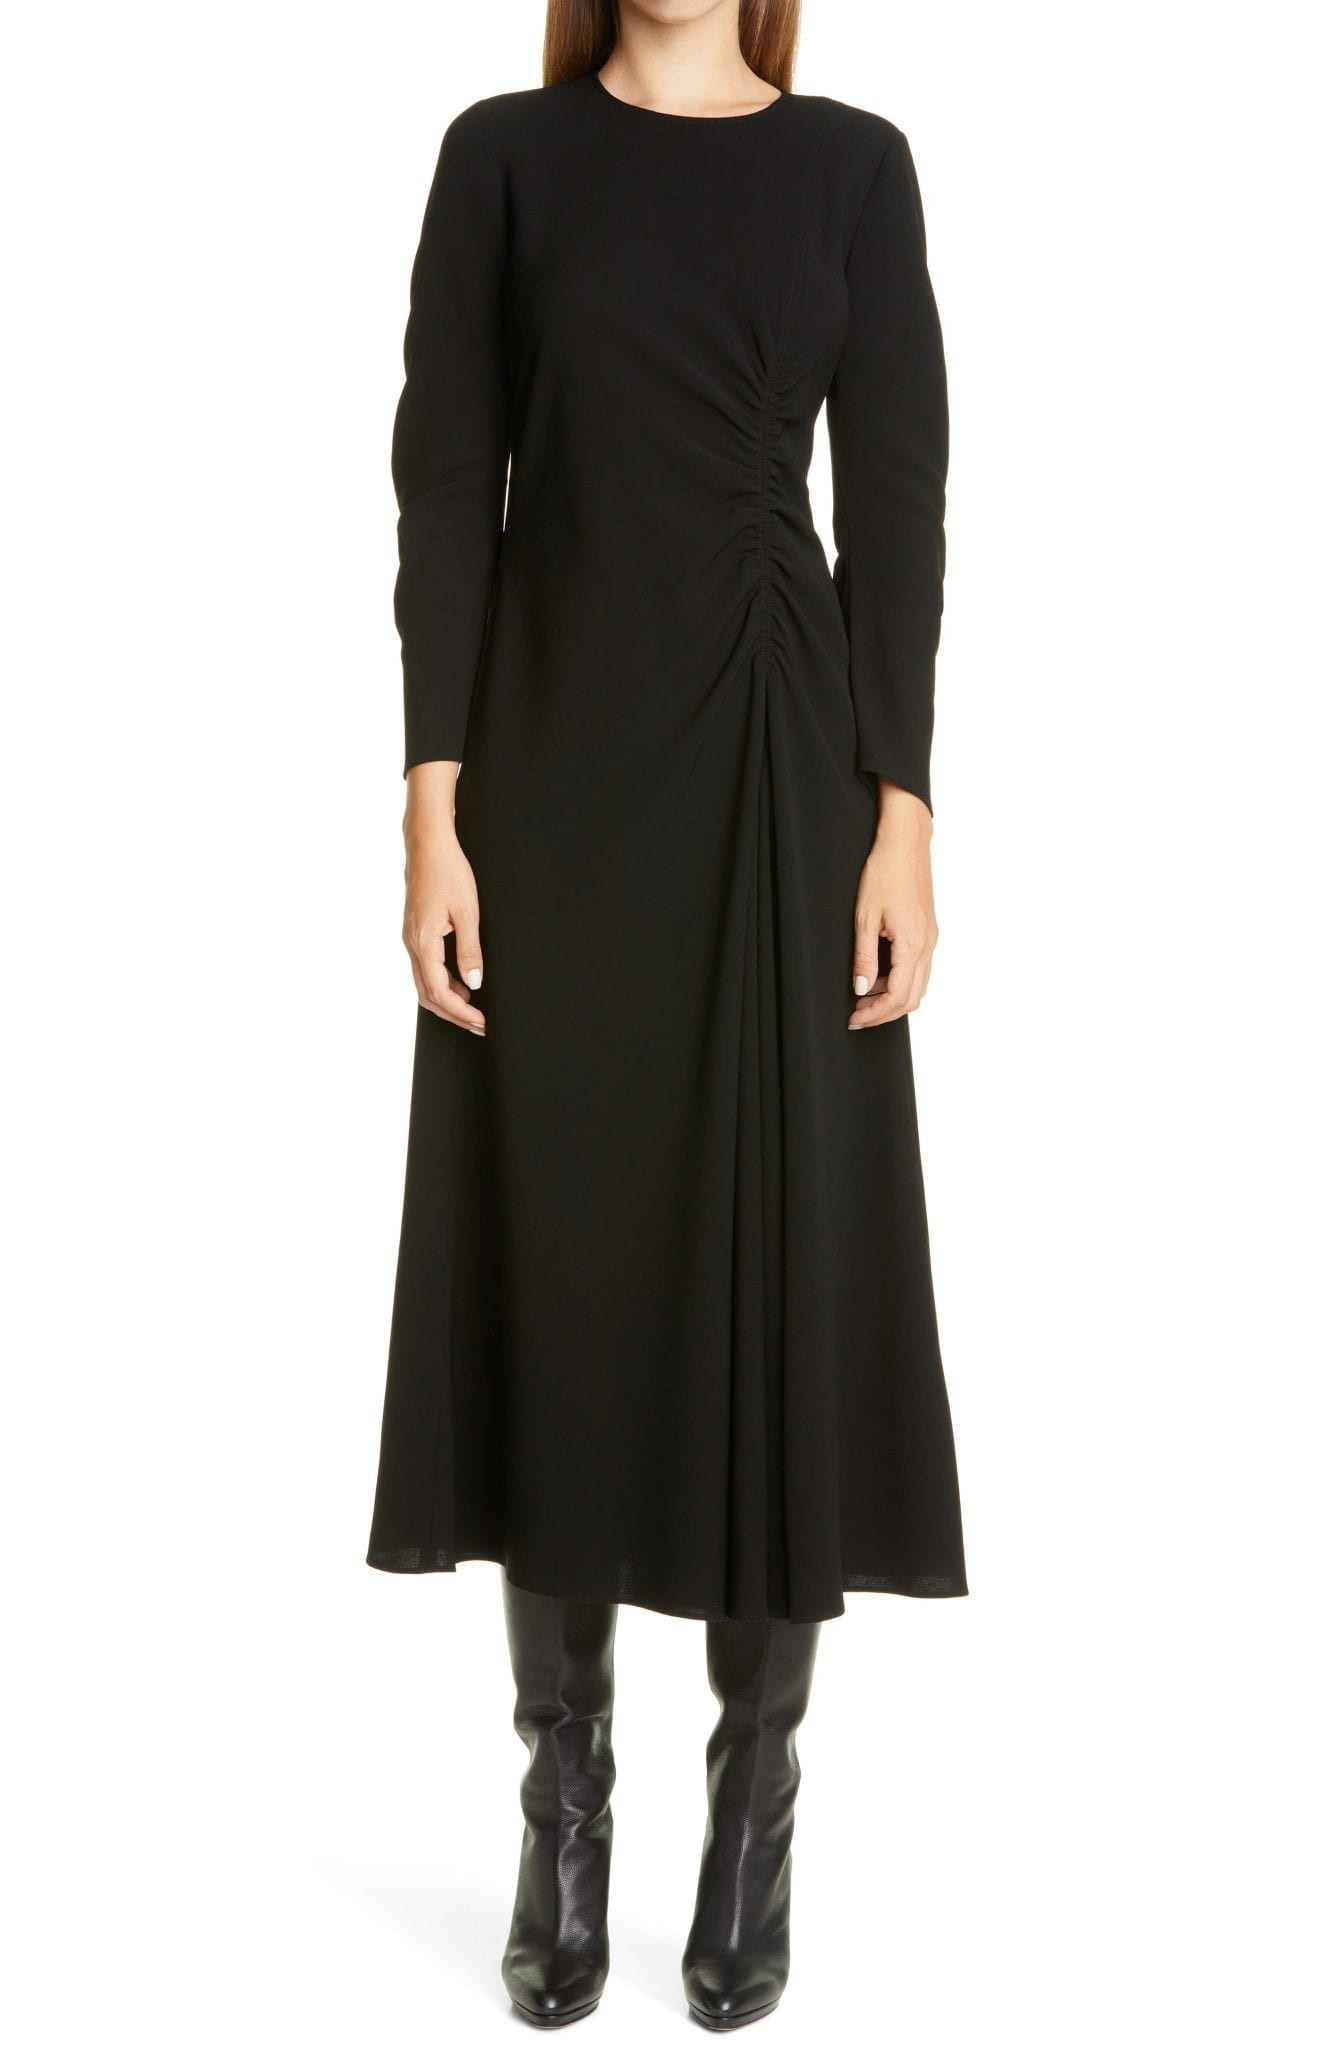 LAFAYETTE 148 NEW YORK Collina Ruched Long Sleeve Midi Dress